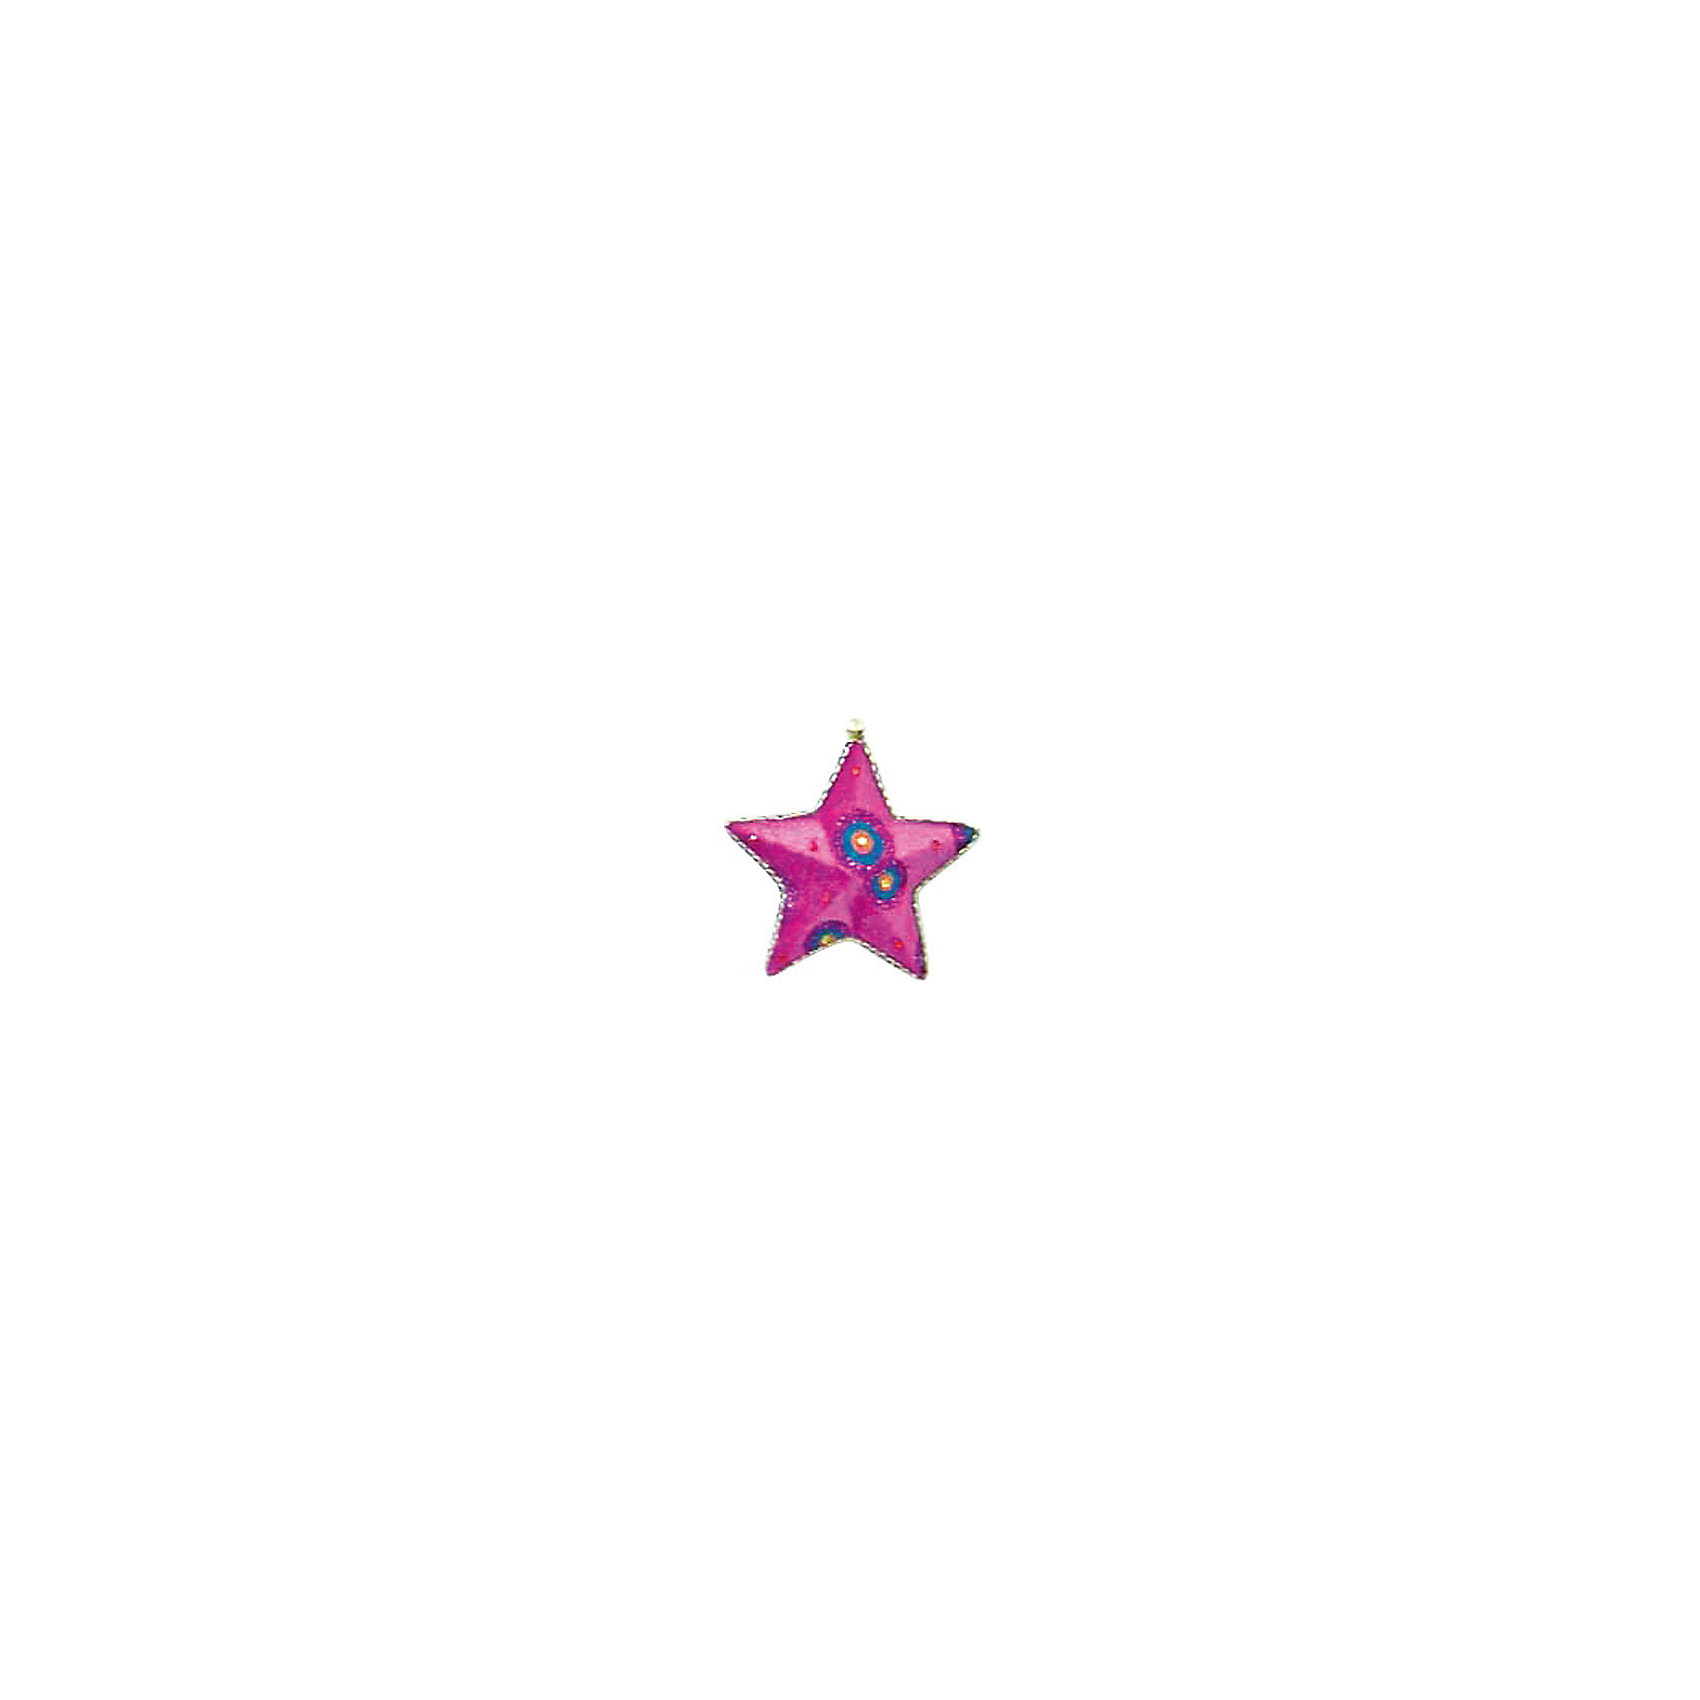 Marko Ferenzo Украшение Детская: звезда флок, 13 см